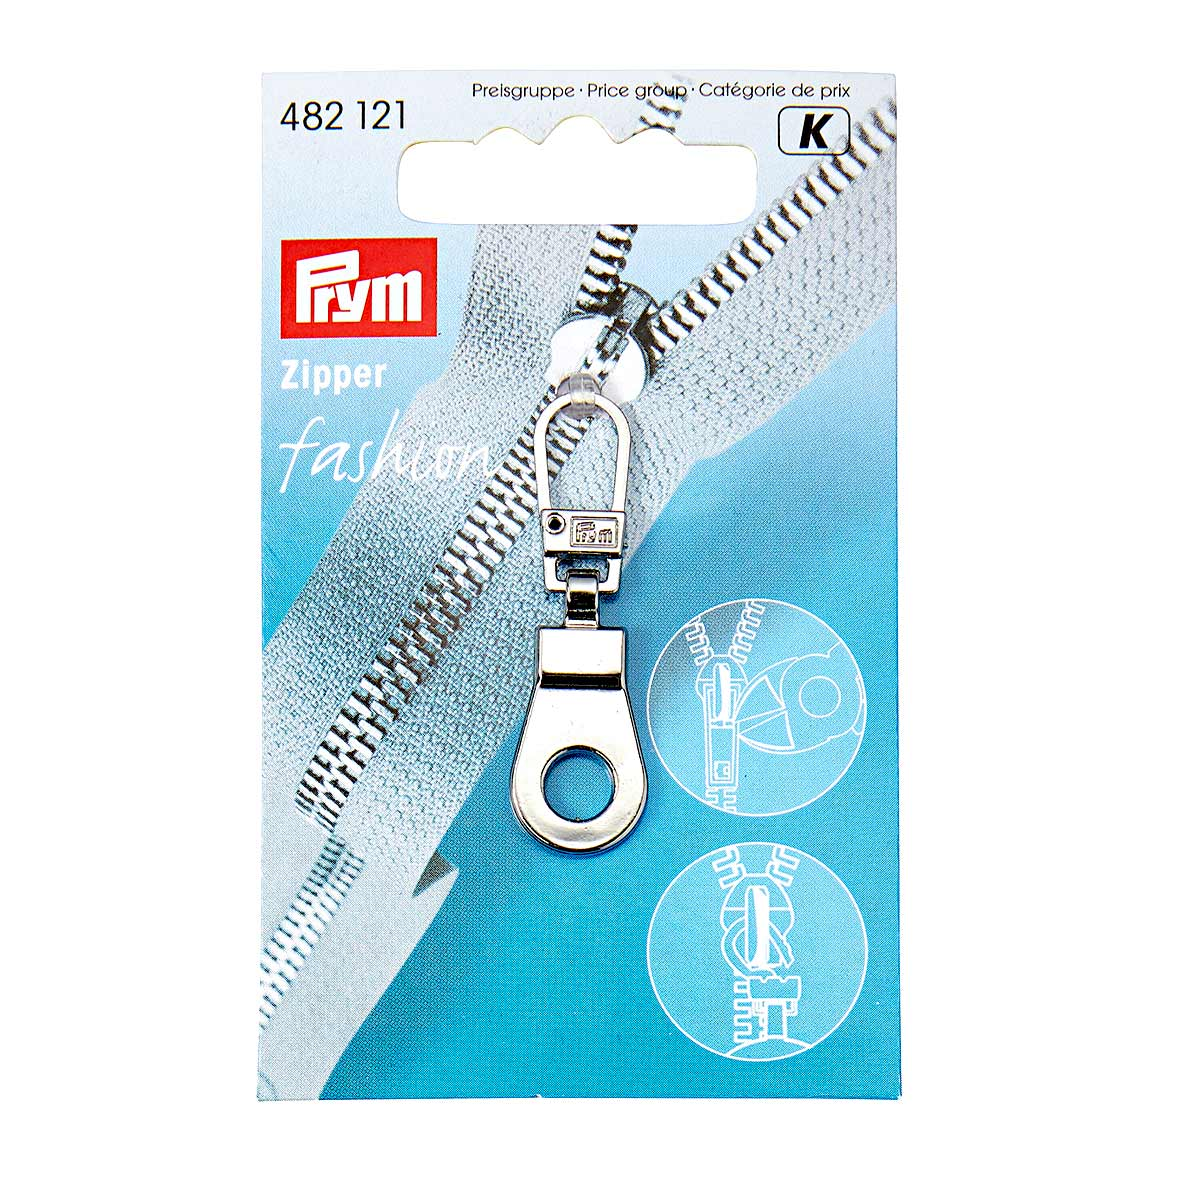 482121 Подвеска для молний (люверс), металл, серебристый, Prym